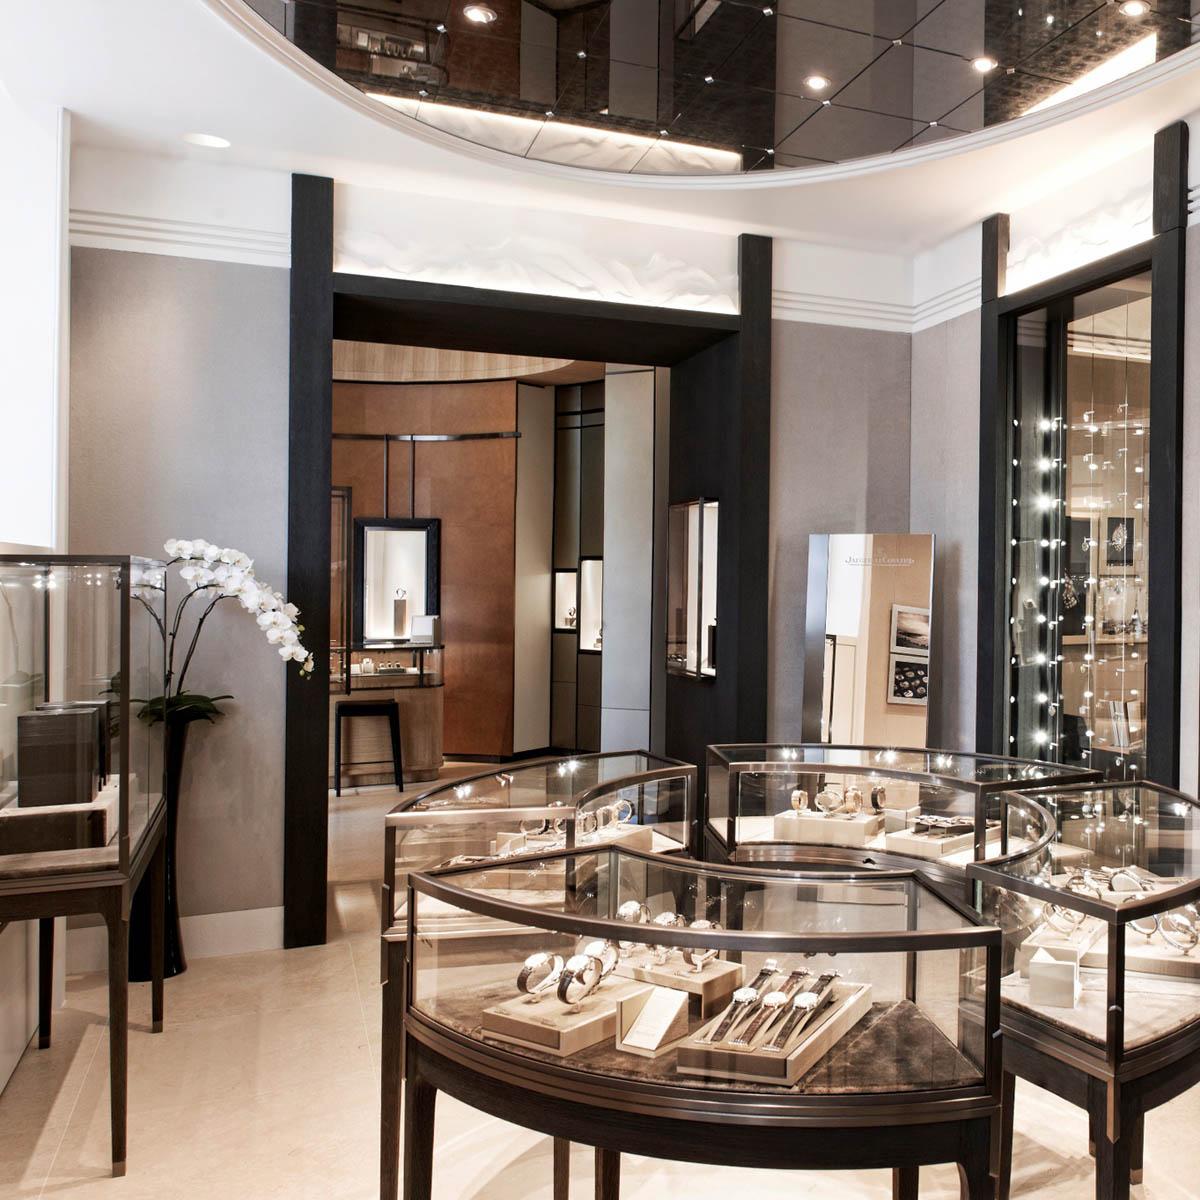 The Watch Quote: Photo - Jaeger-LeCoultre unveils its new boutique on the Place Vendôme